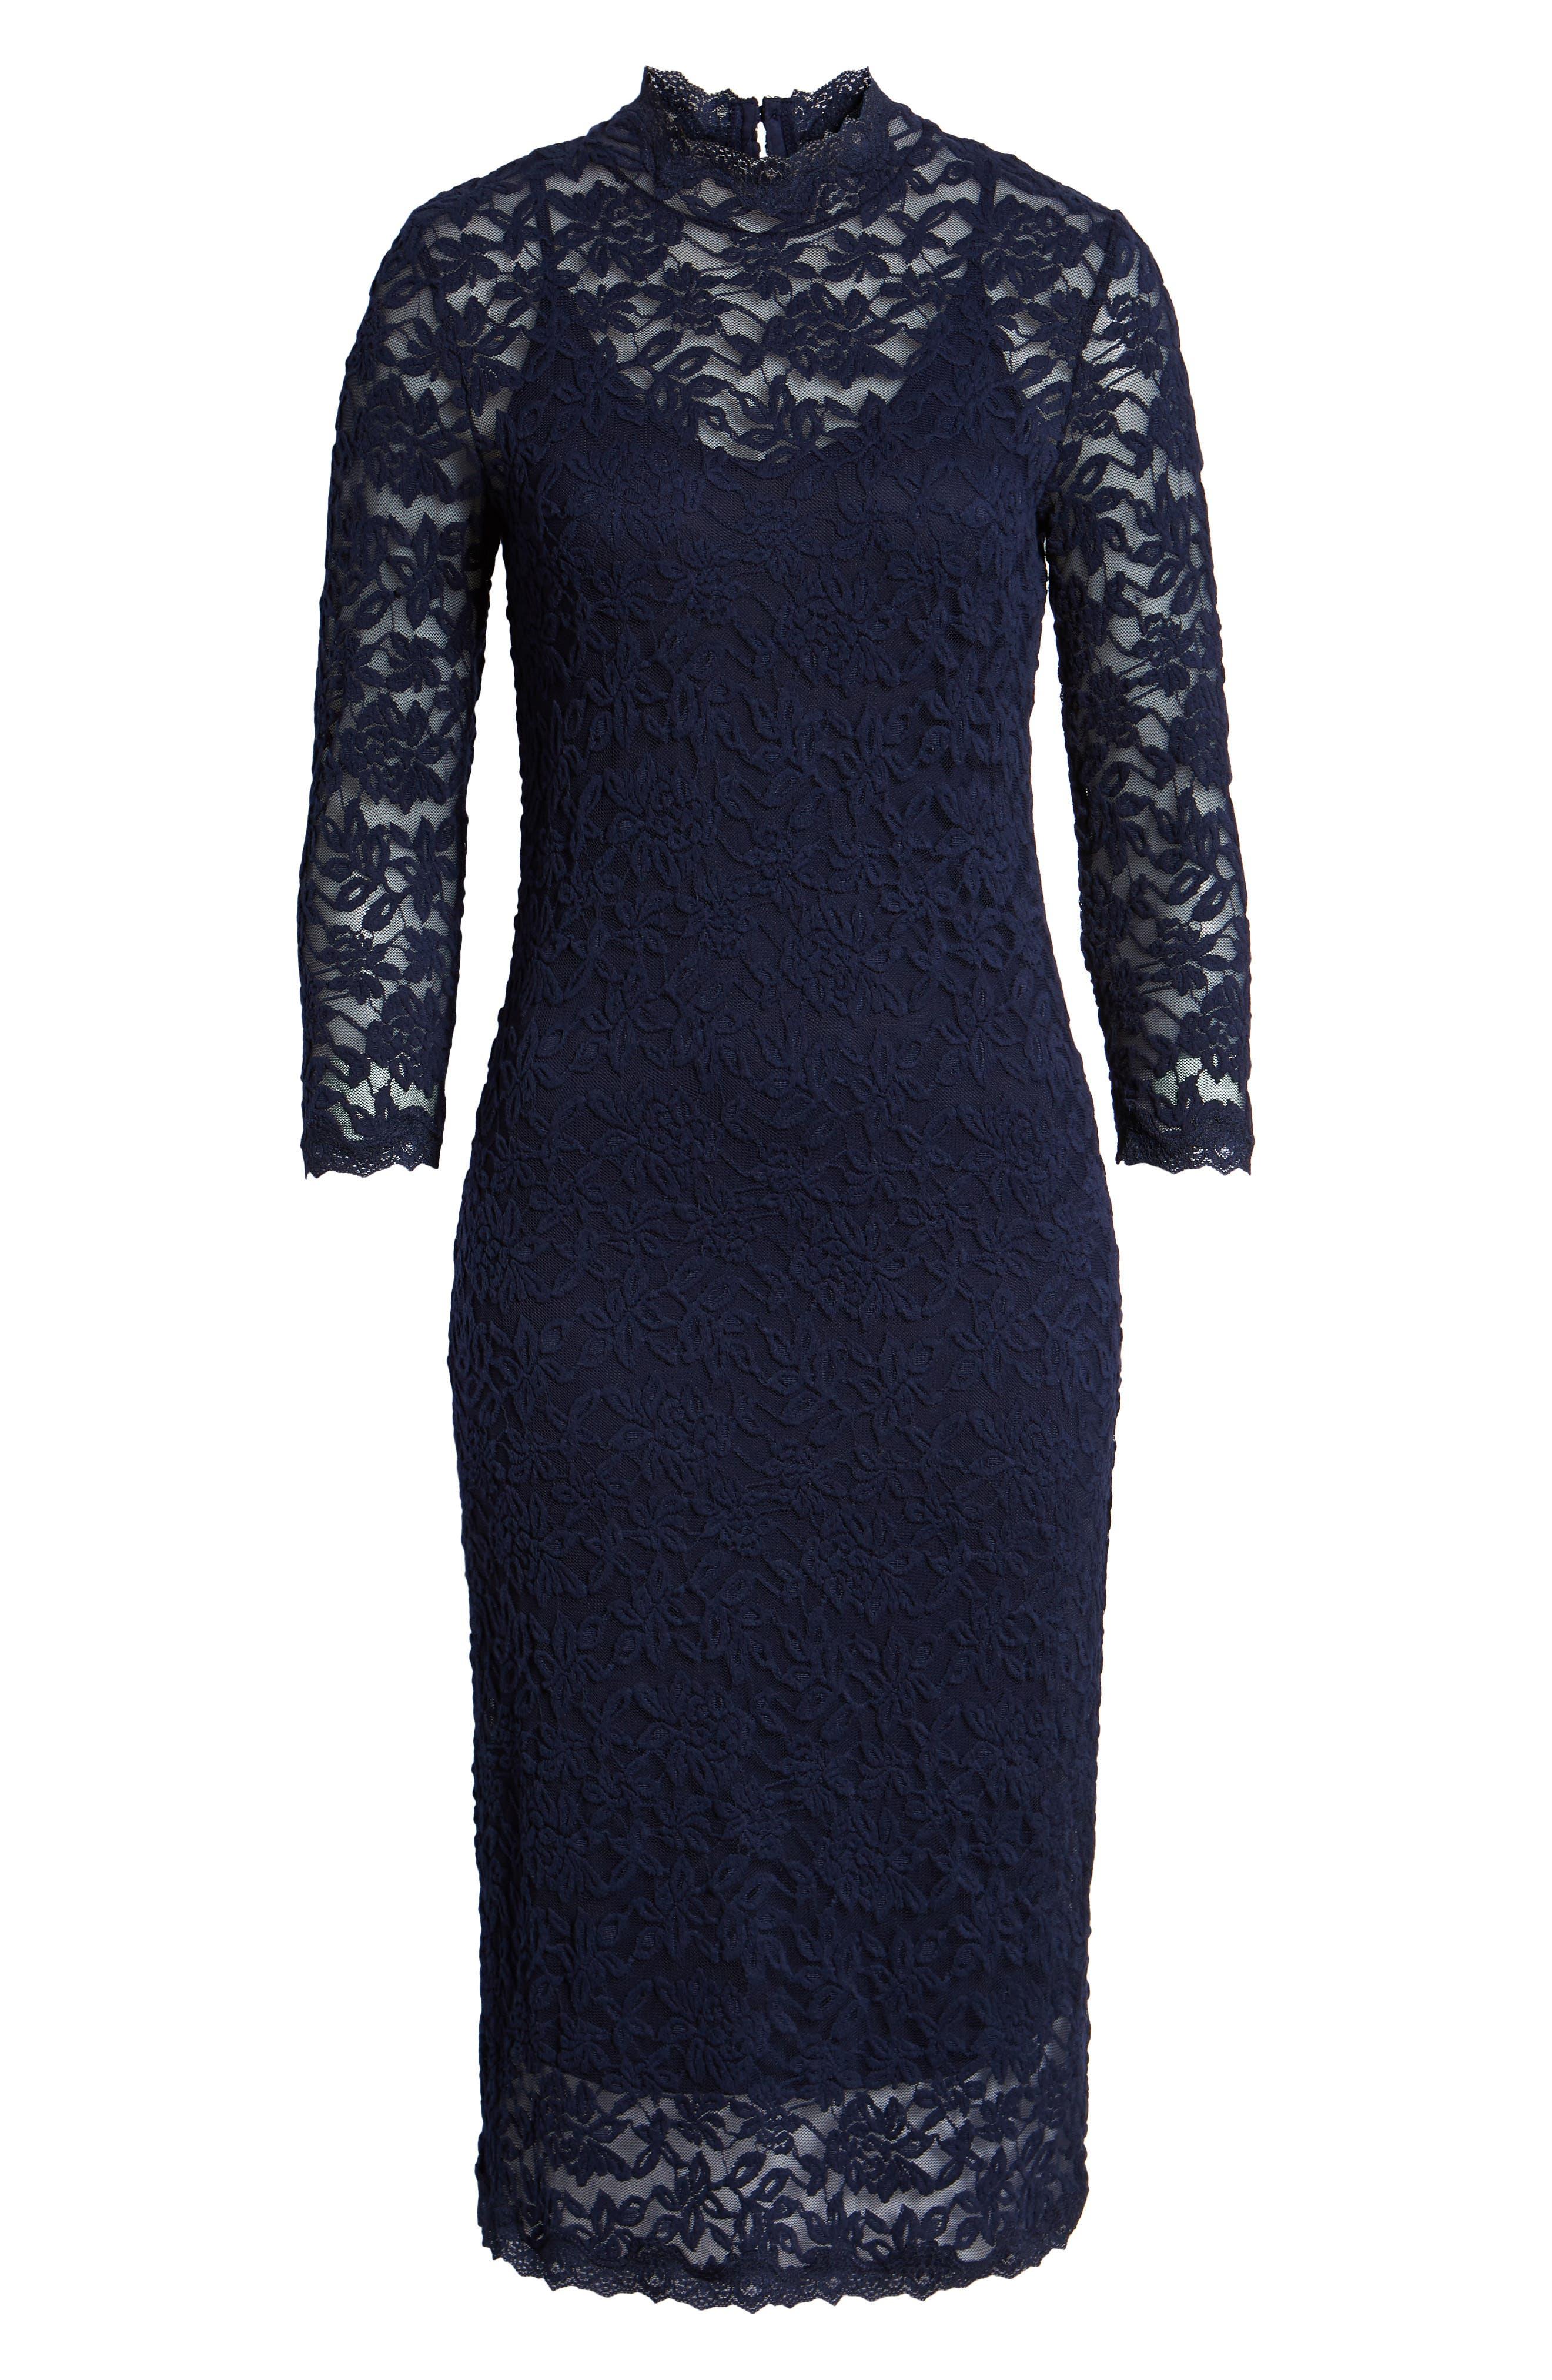 ROSEMUNDE, Delicia Lace Body-Con Dress, Alternate thumbnail 7, color, MARITIME BLUE